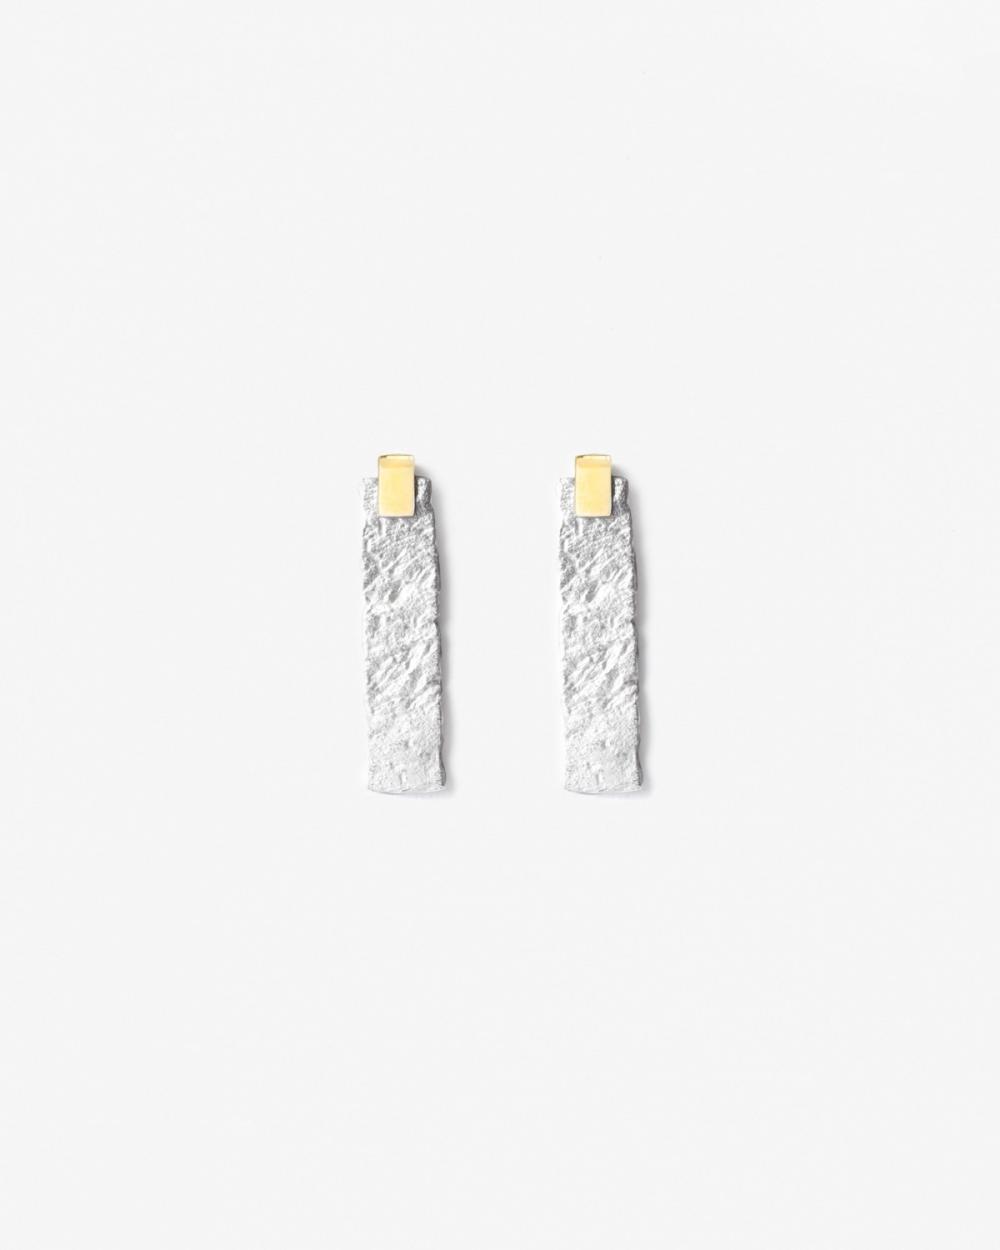 Earrings MATERIC WHITE PLATE PAIR EARRINGS NOVE25